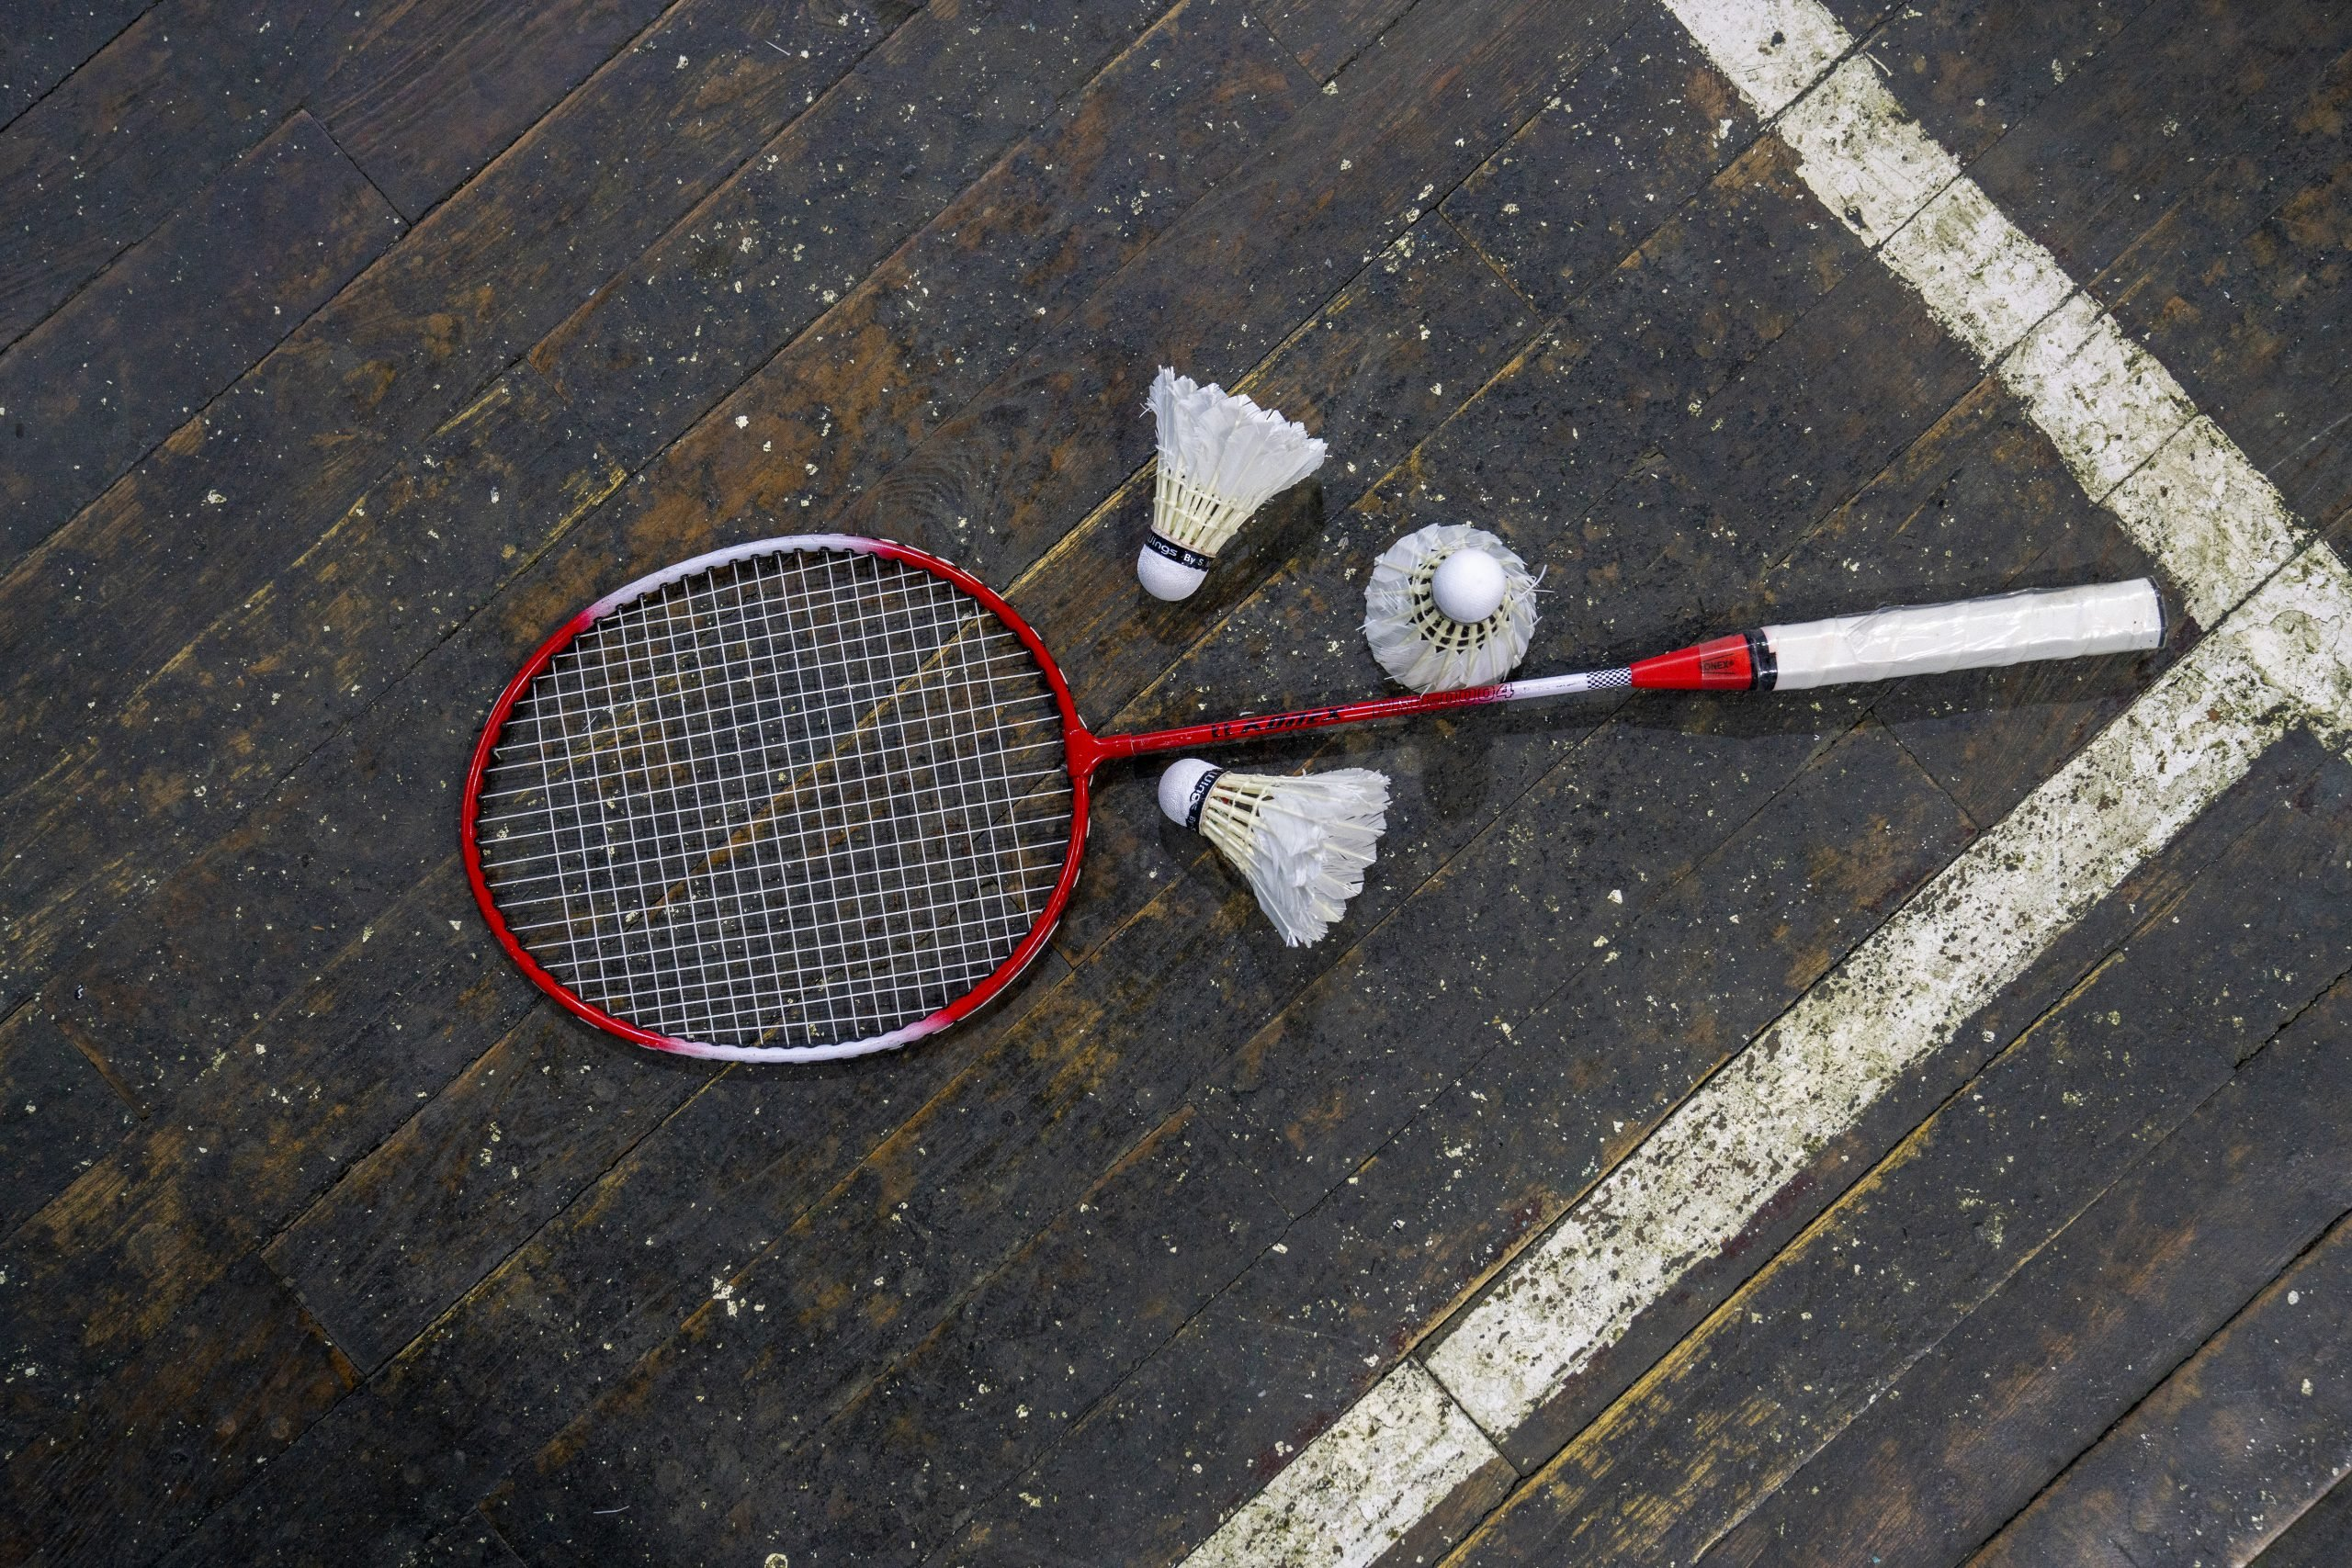 Badminton sports